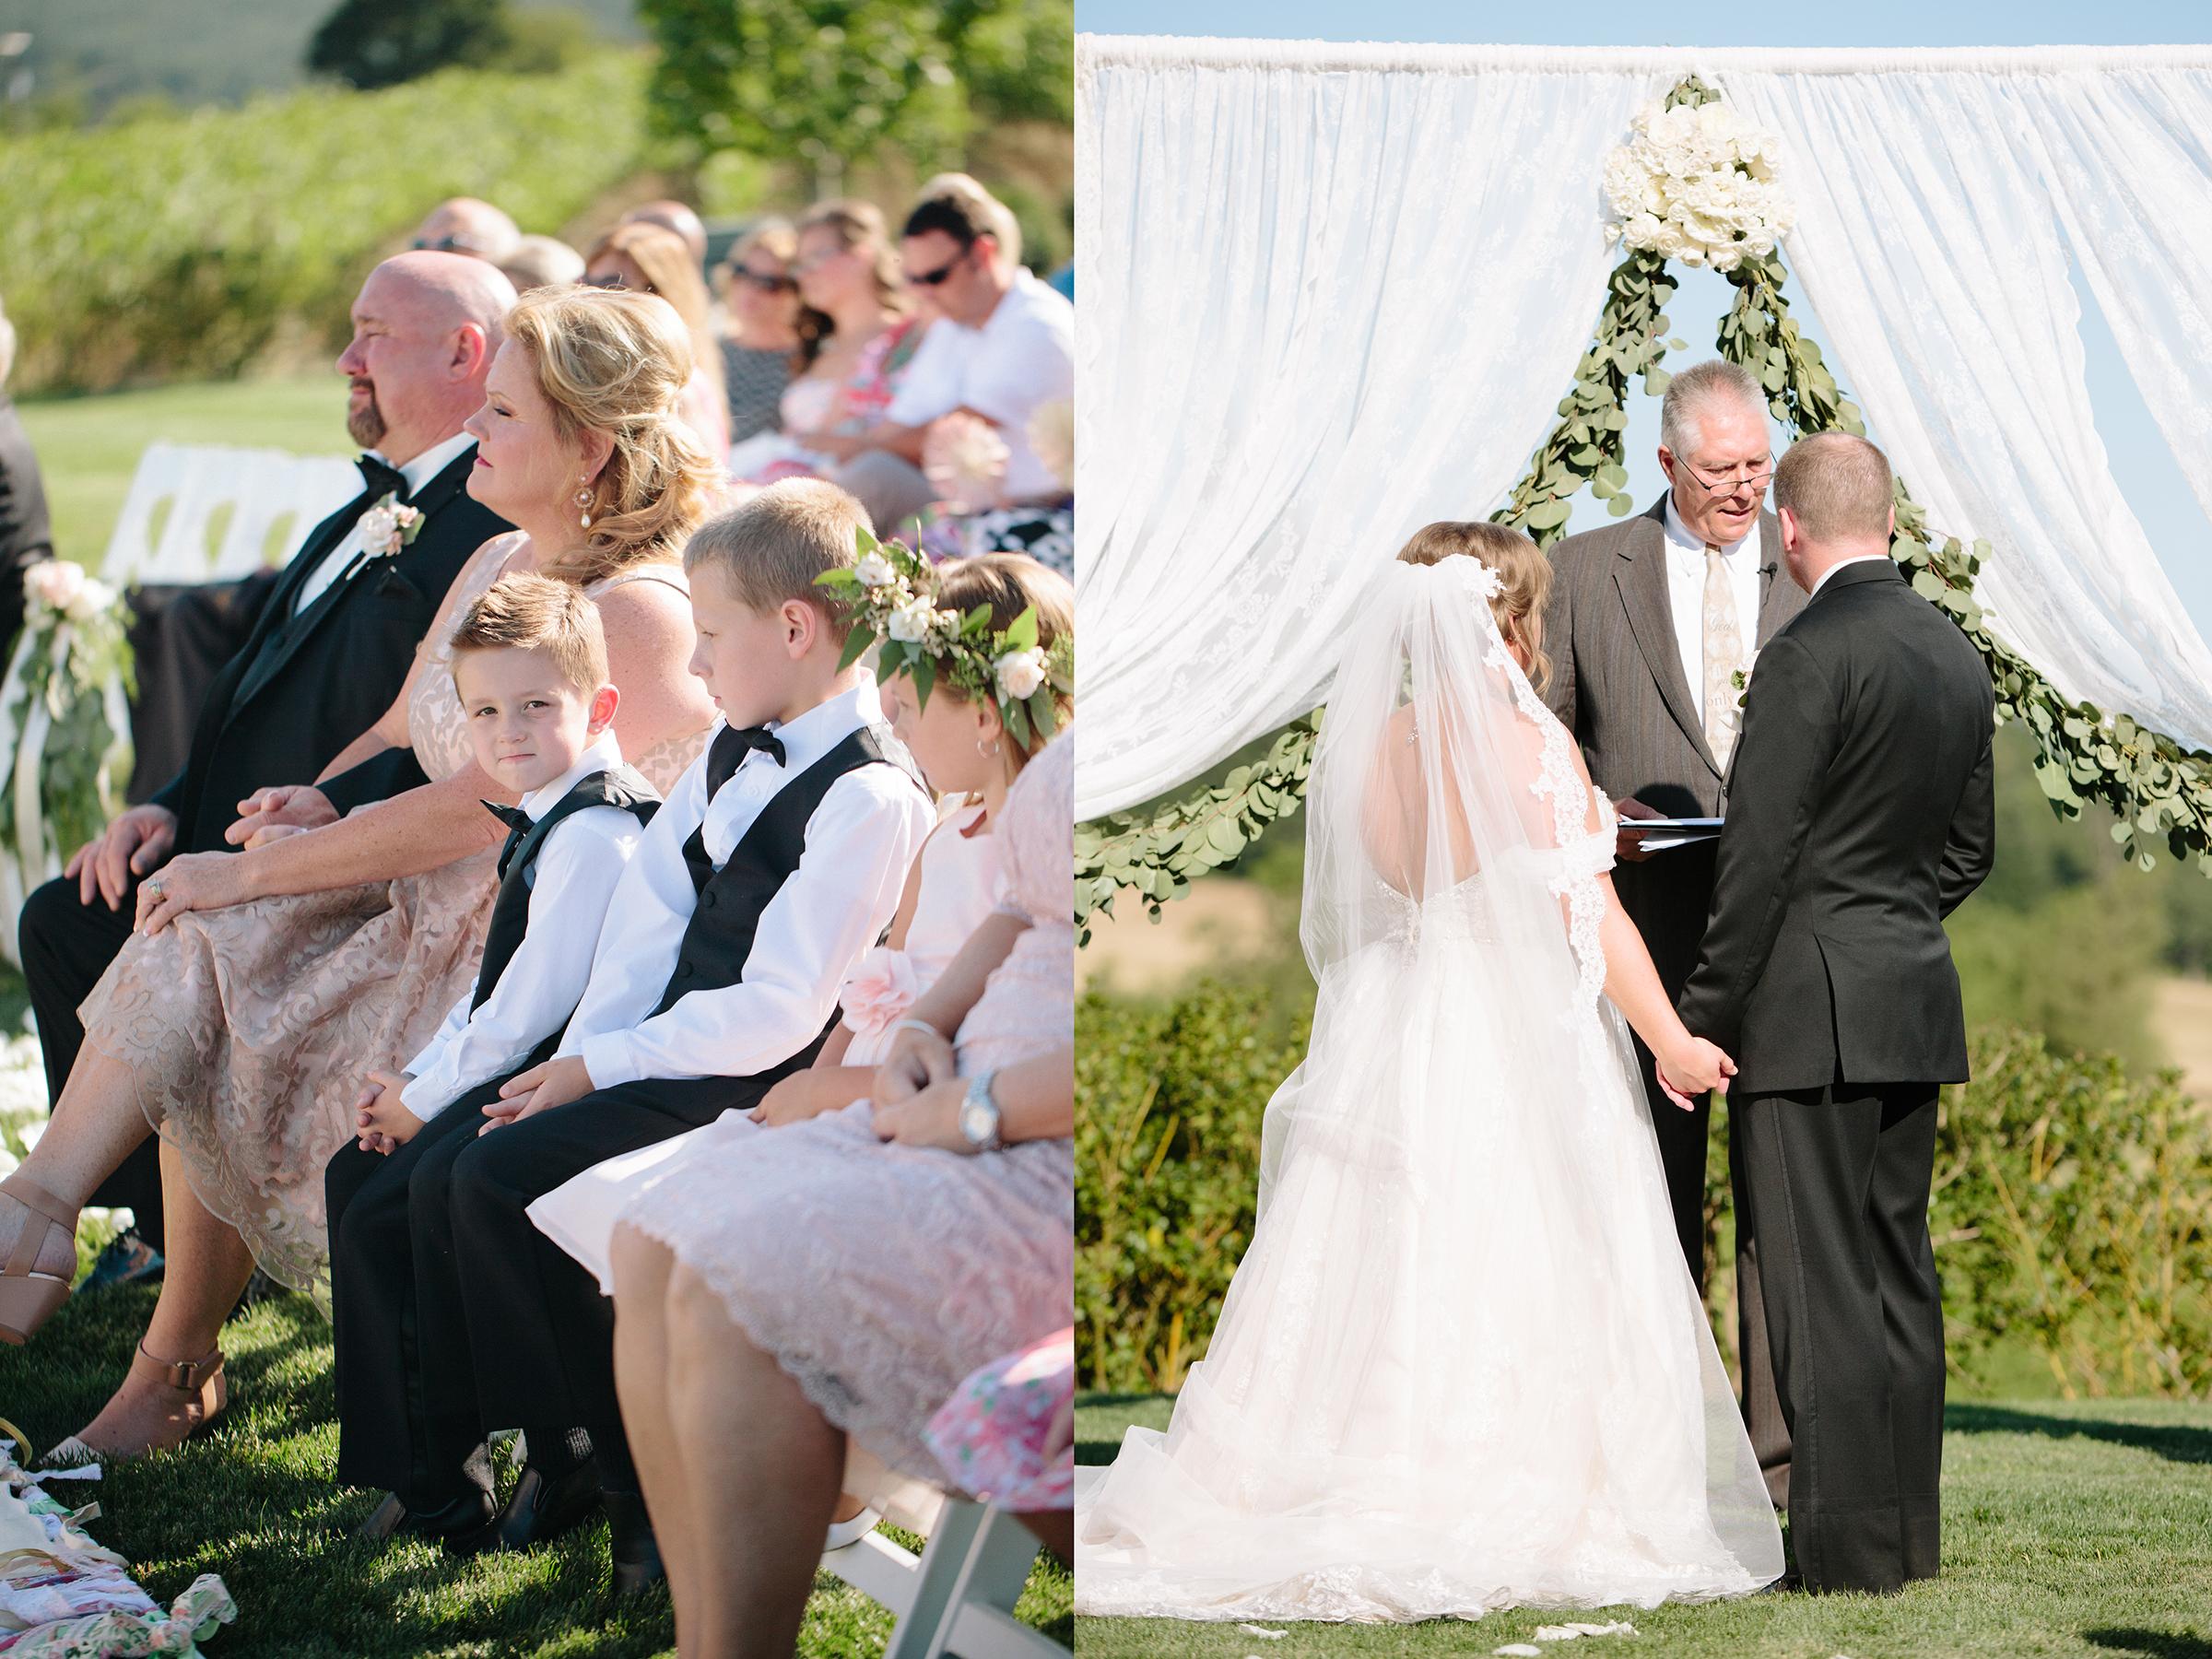 Oregon Wedding Zenith Vineyard by Michelle Cross-48.jpg